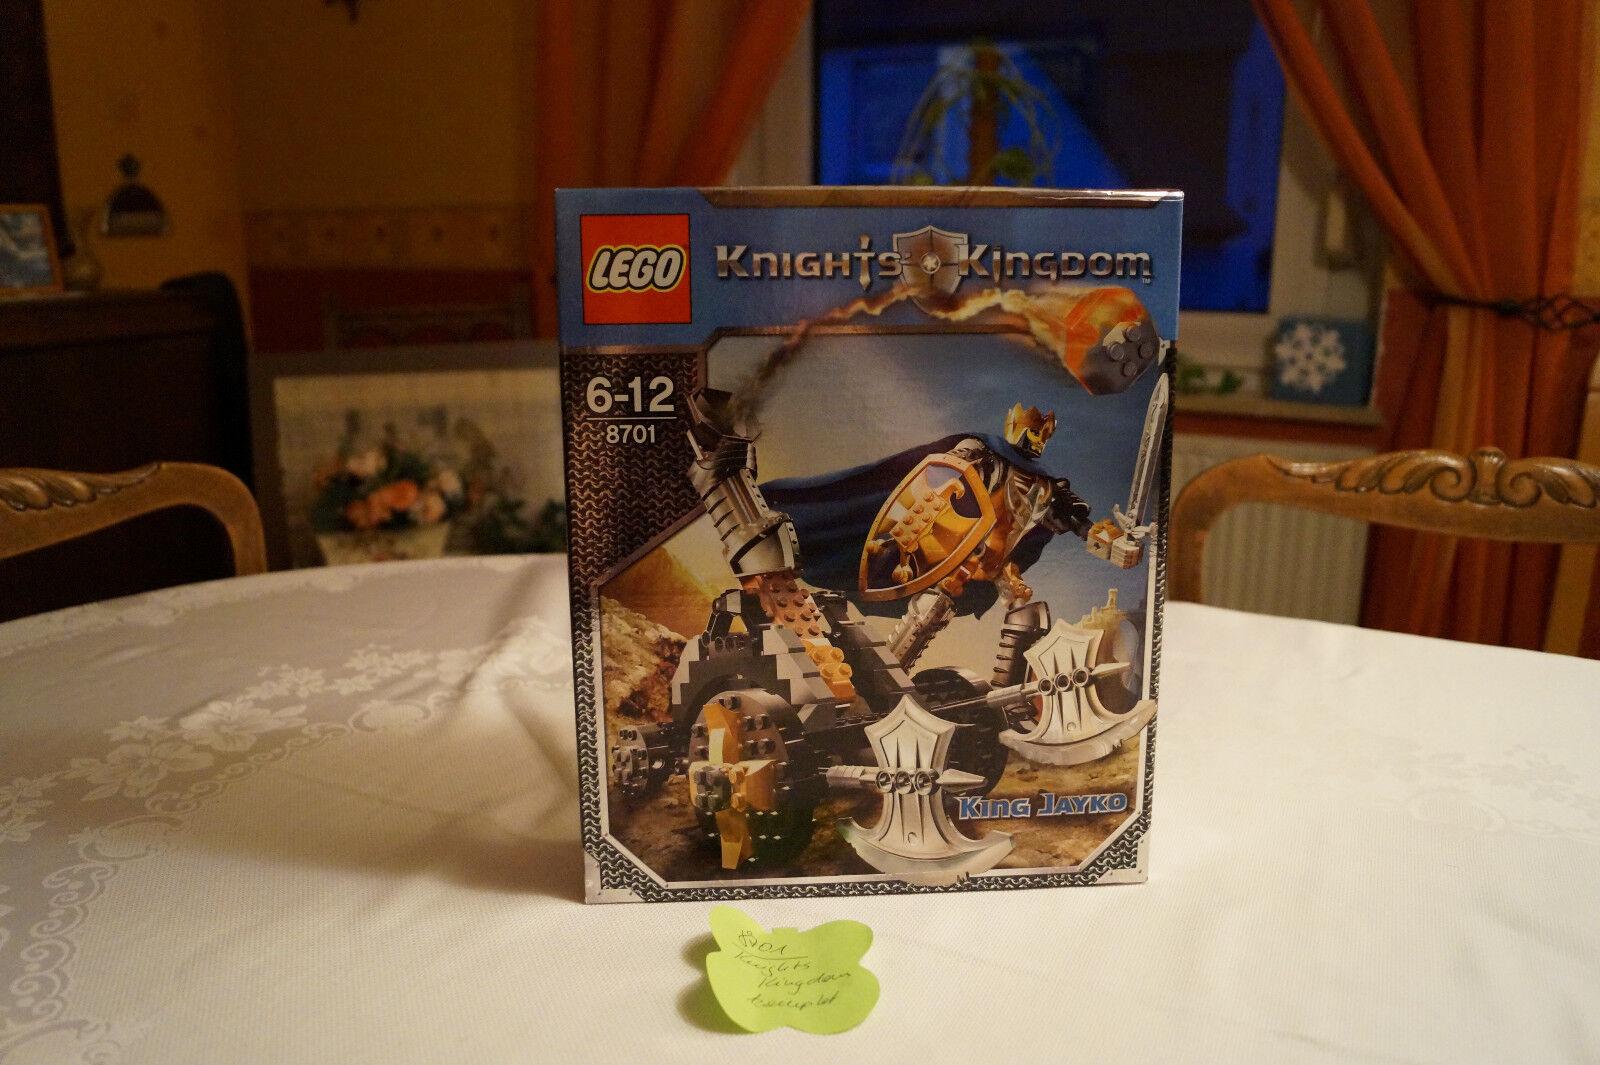 LEGO 8701 Knights Kingdom  King Jayko mit Katapult  ab 6 Jahre Bauplan